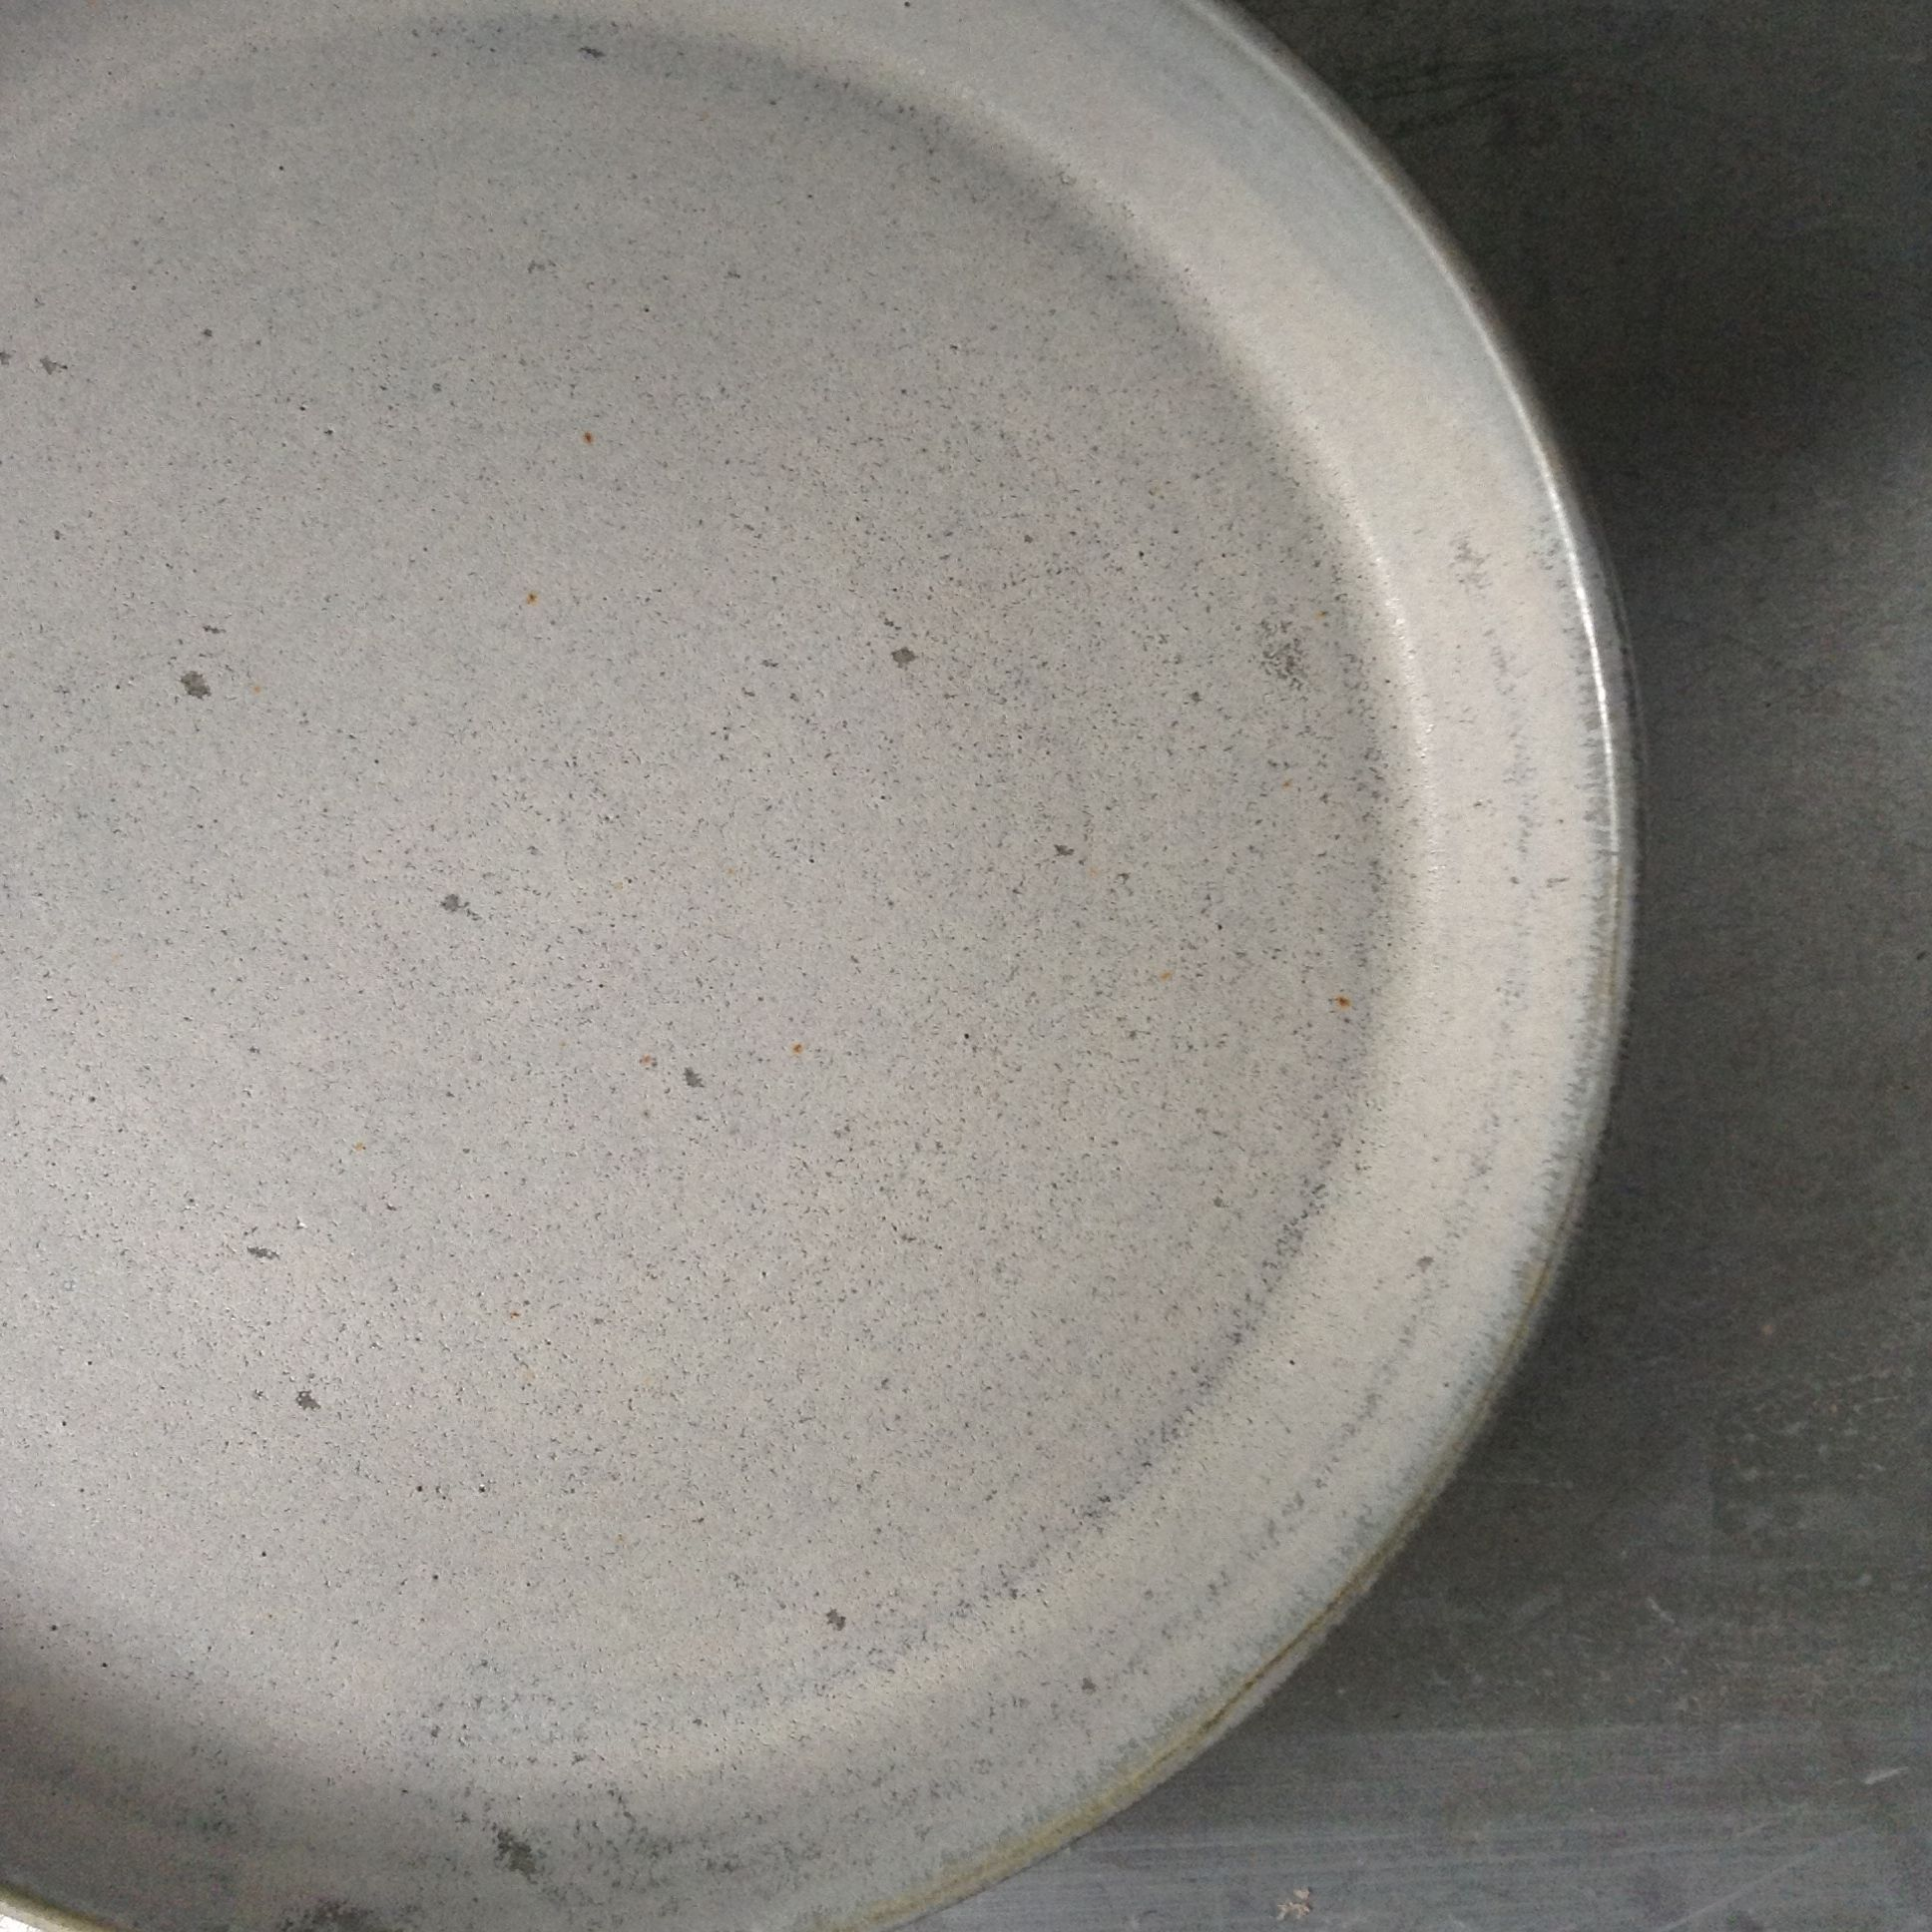 Stone Dinner Plate Speck+Stone stoneware speckandstone.com & Stone Dinner Plate Speck+Stone stoneware speckandstone.com   Speck + ...